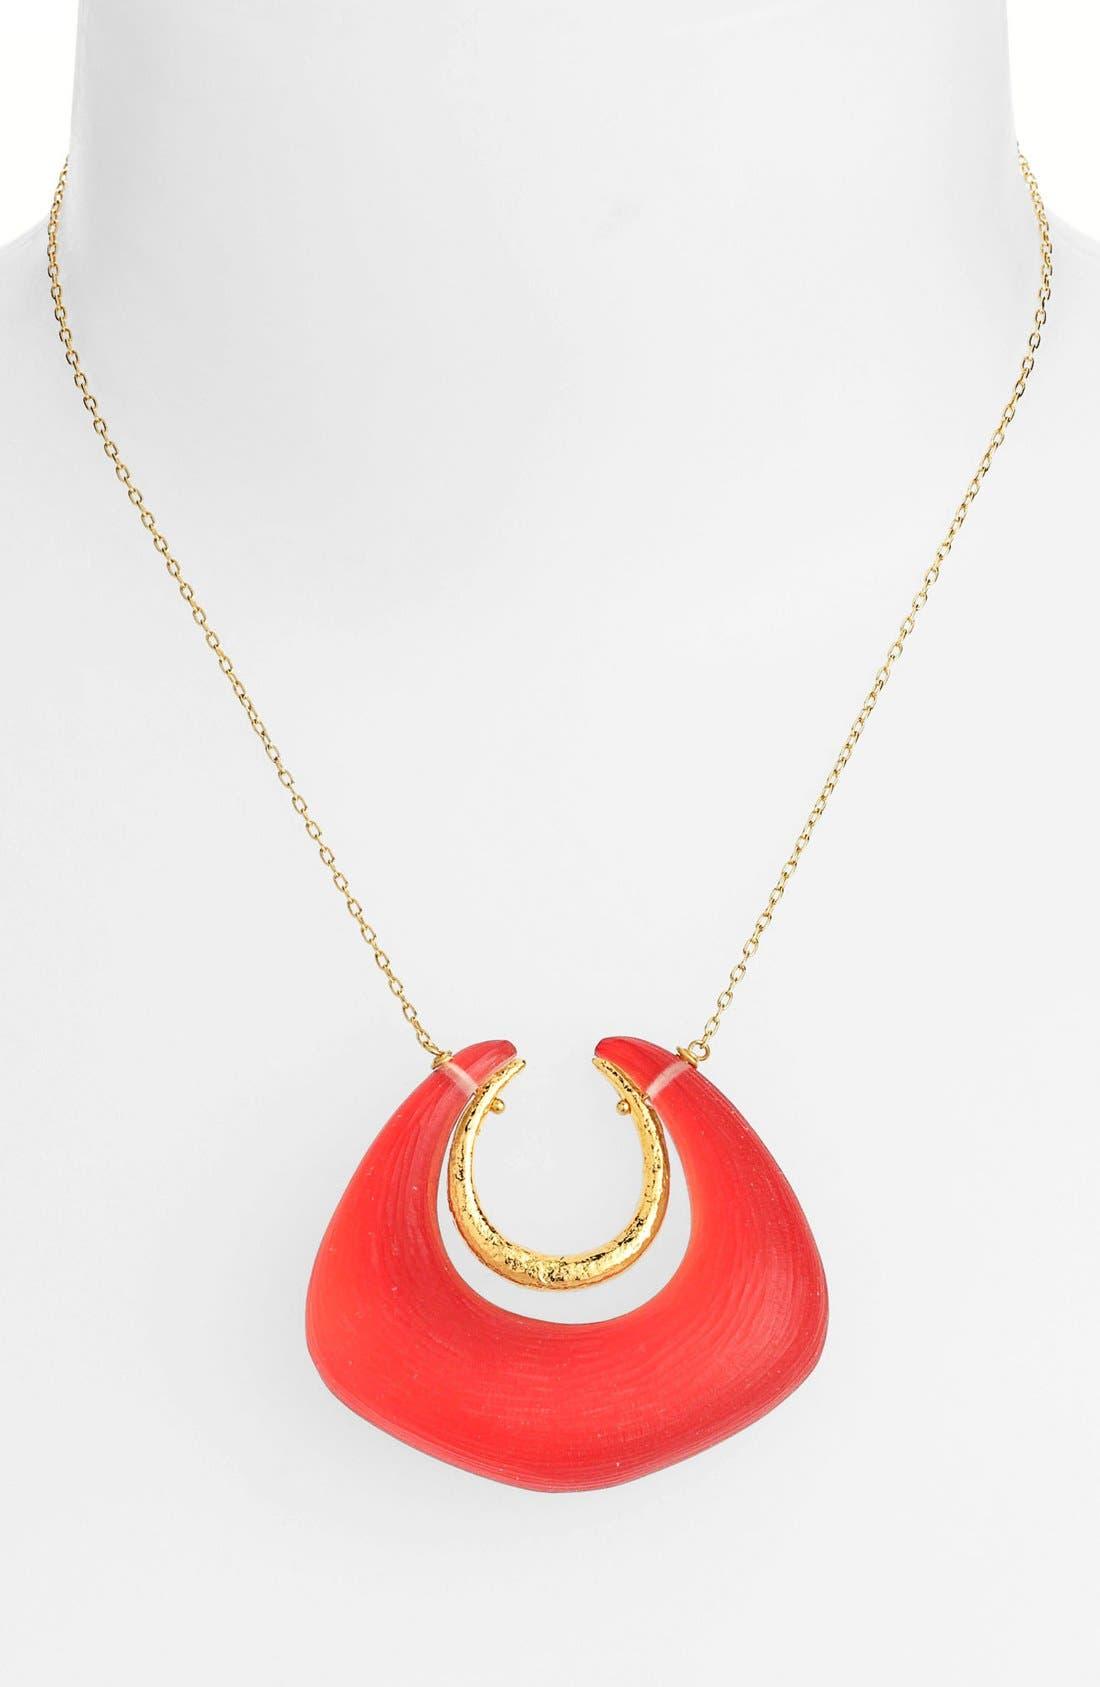 Main Image - Alexis Bittar 'Lucite®' Angled Horseshoe Pendant Necklace